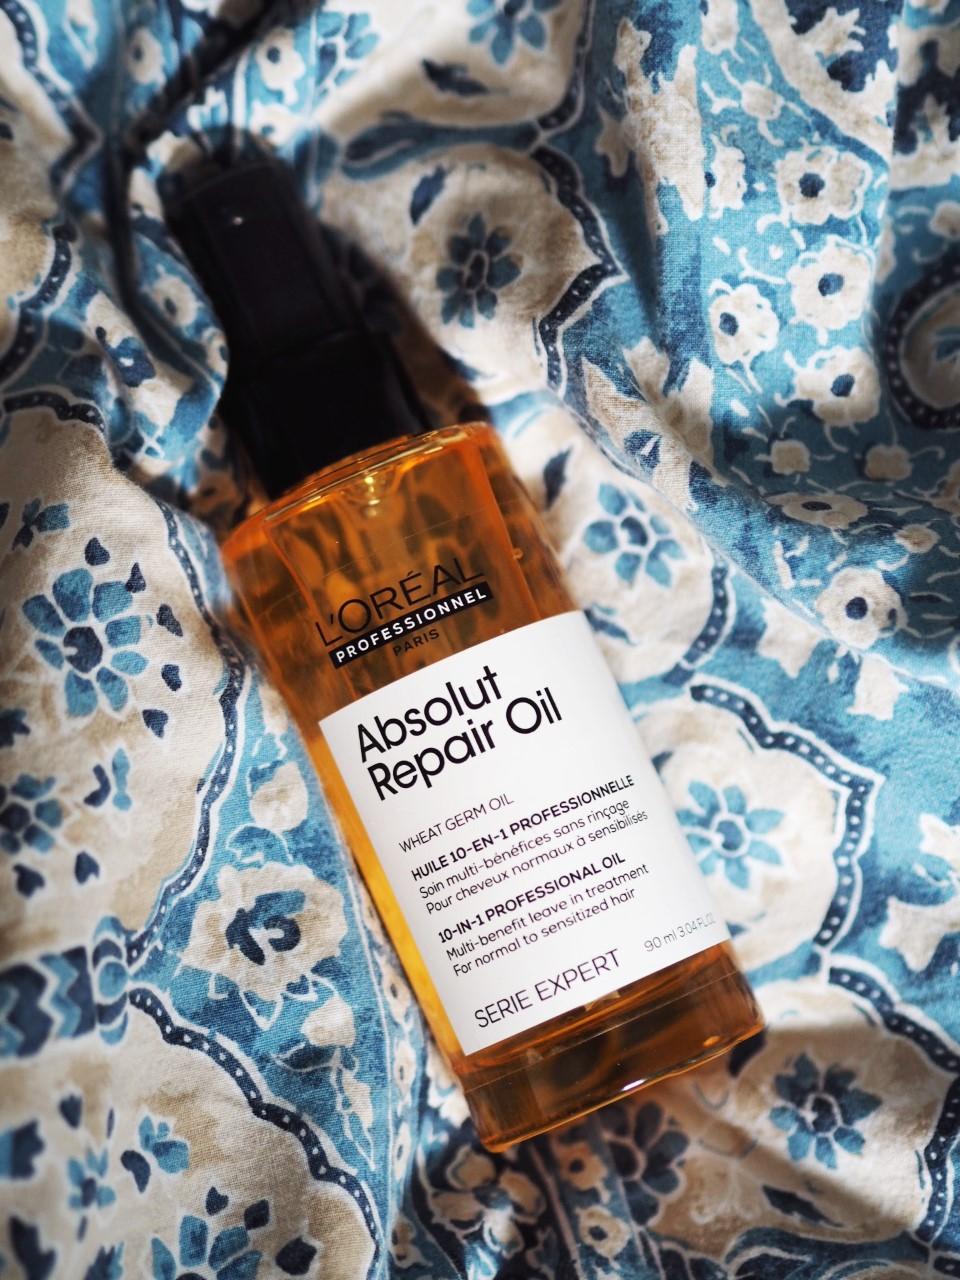 L'Oréal Professionnel Absolut Repair Hair Oil